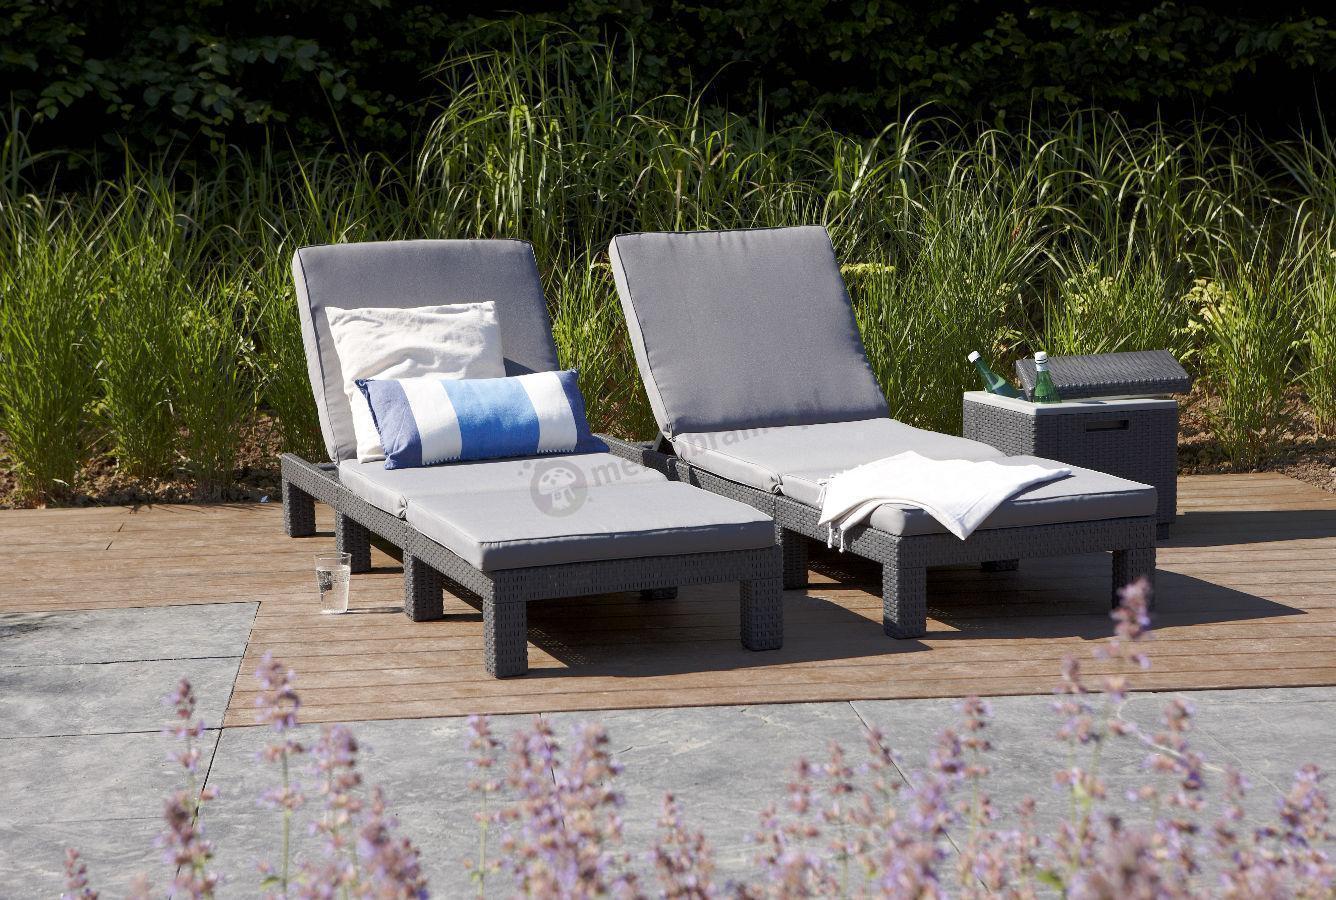 le ak daytona allibert le ak pla owy sk adany. Black Bedroom Furniture Sets. Home Design Ideas